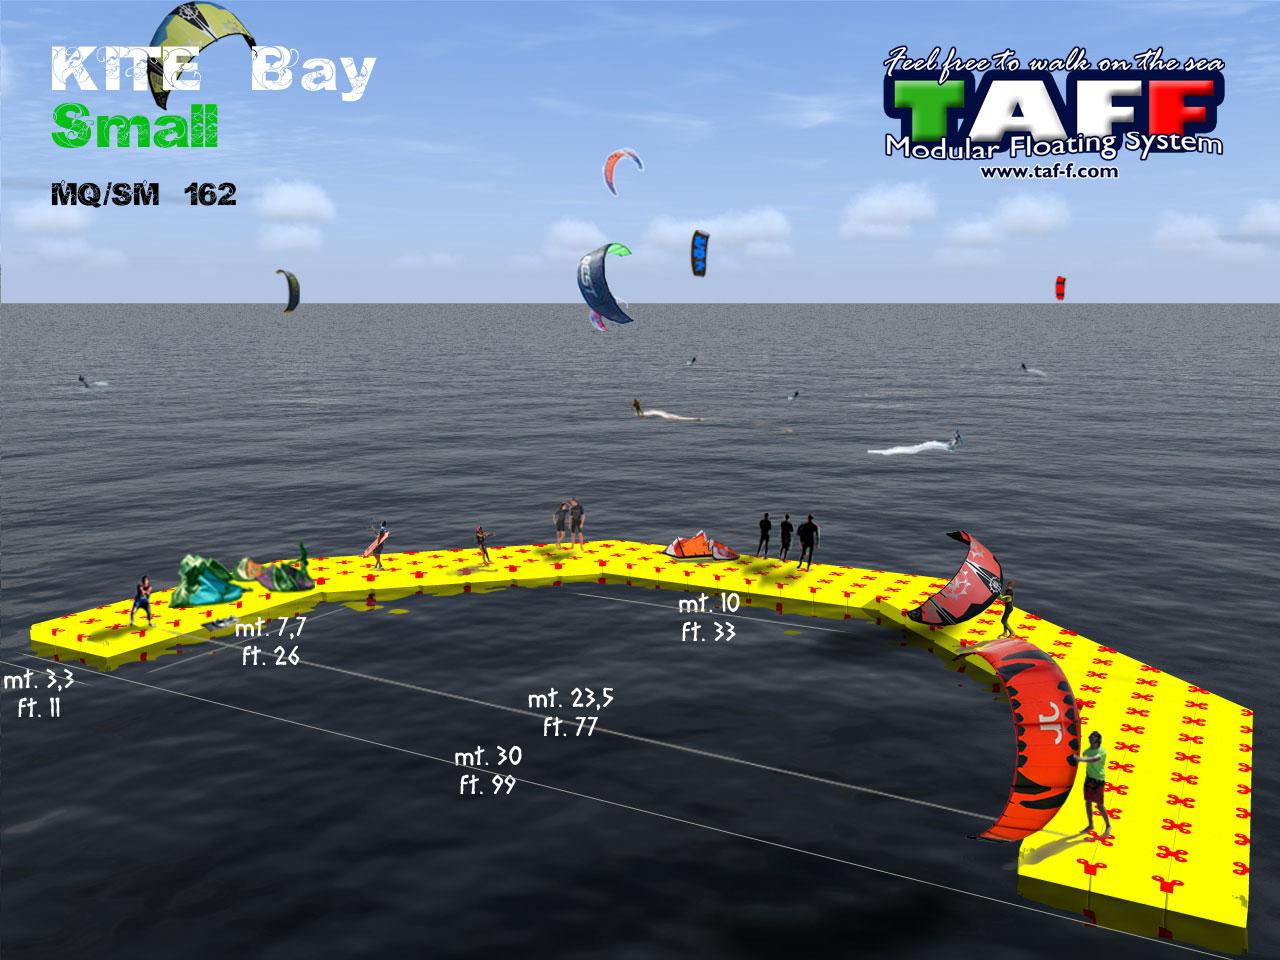 kite-bay-small.jpg